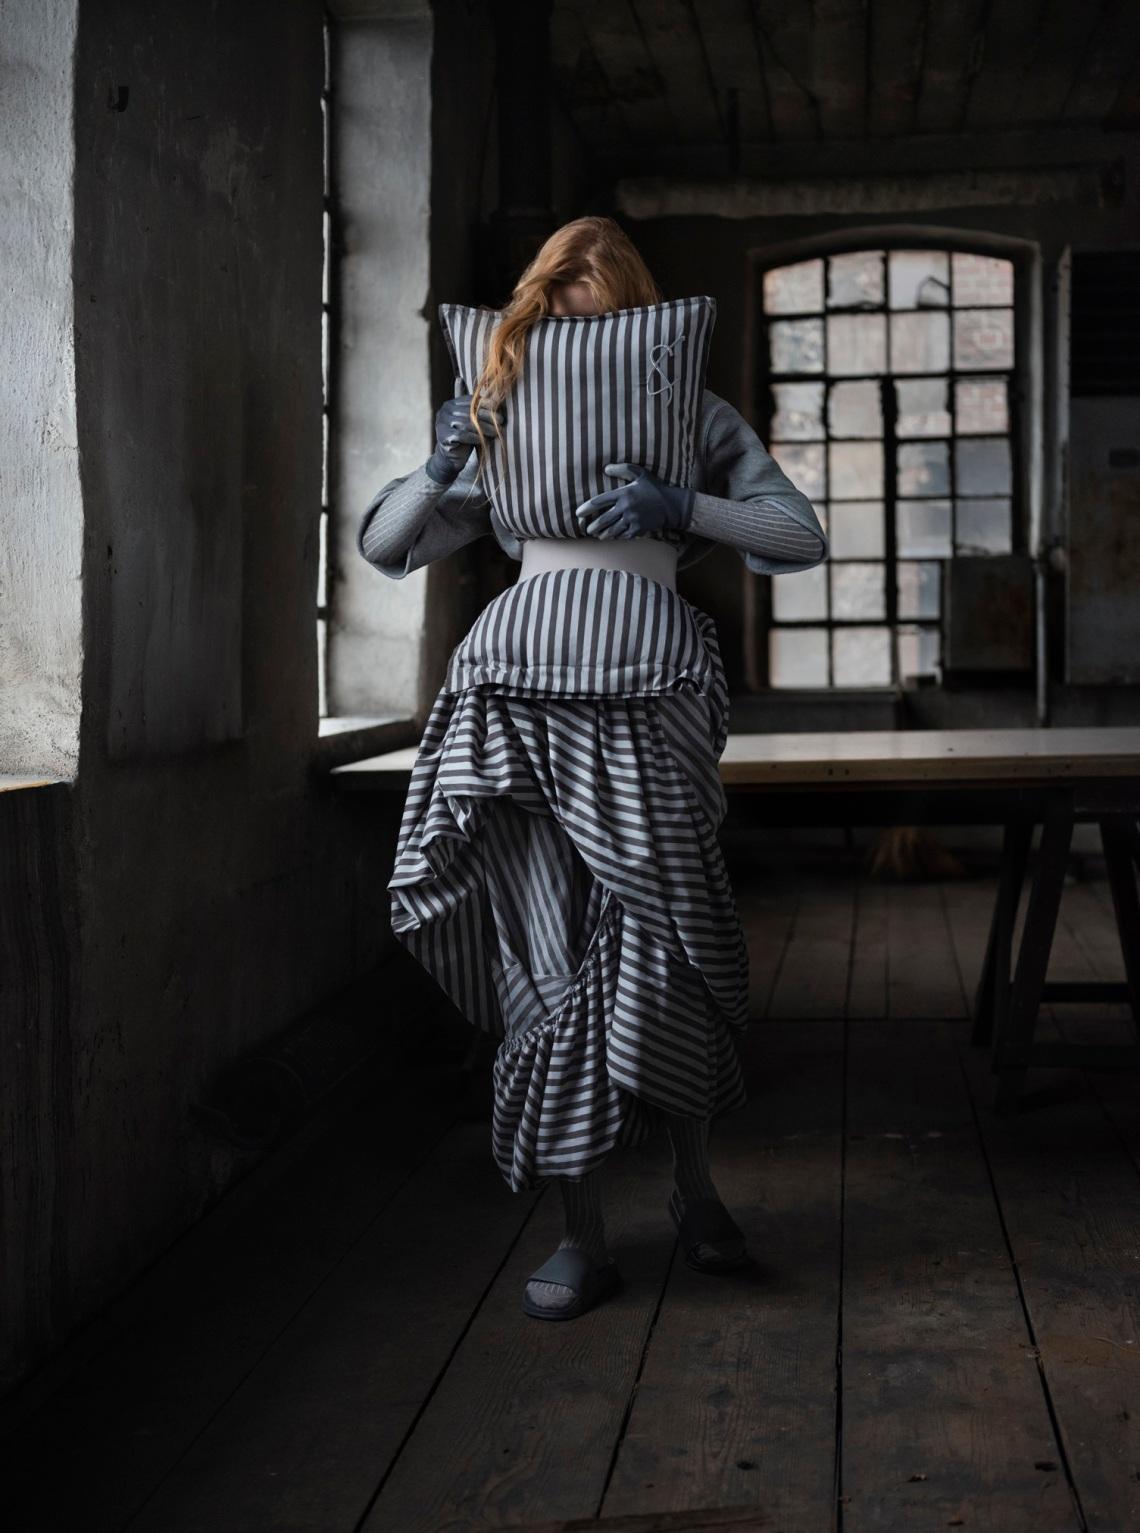 Credits -photograpy Rafael Kroetz - model Zoe Herveva - muah Sabine Nania - Art Direction Cunnington & Sanderson